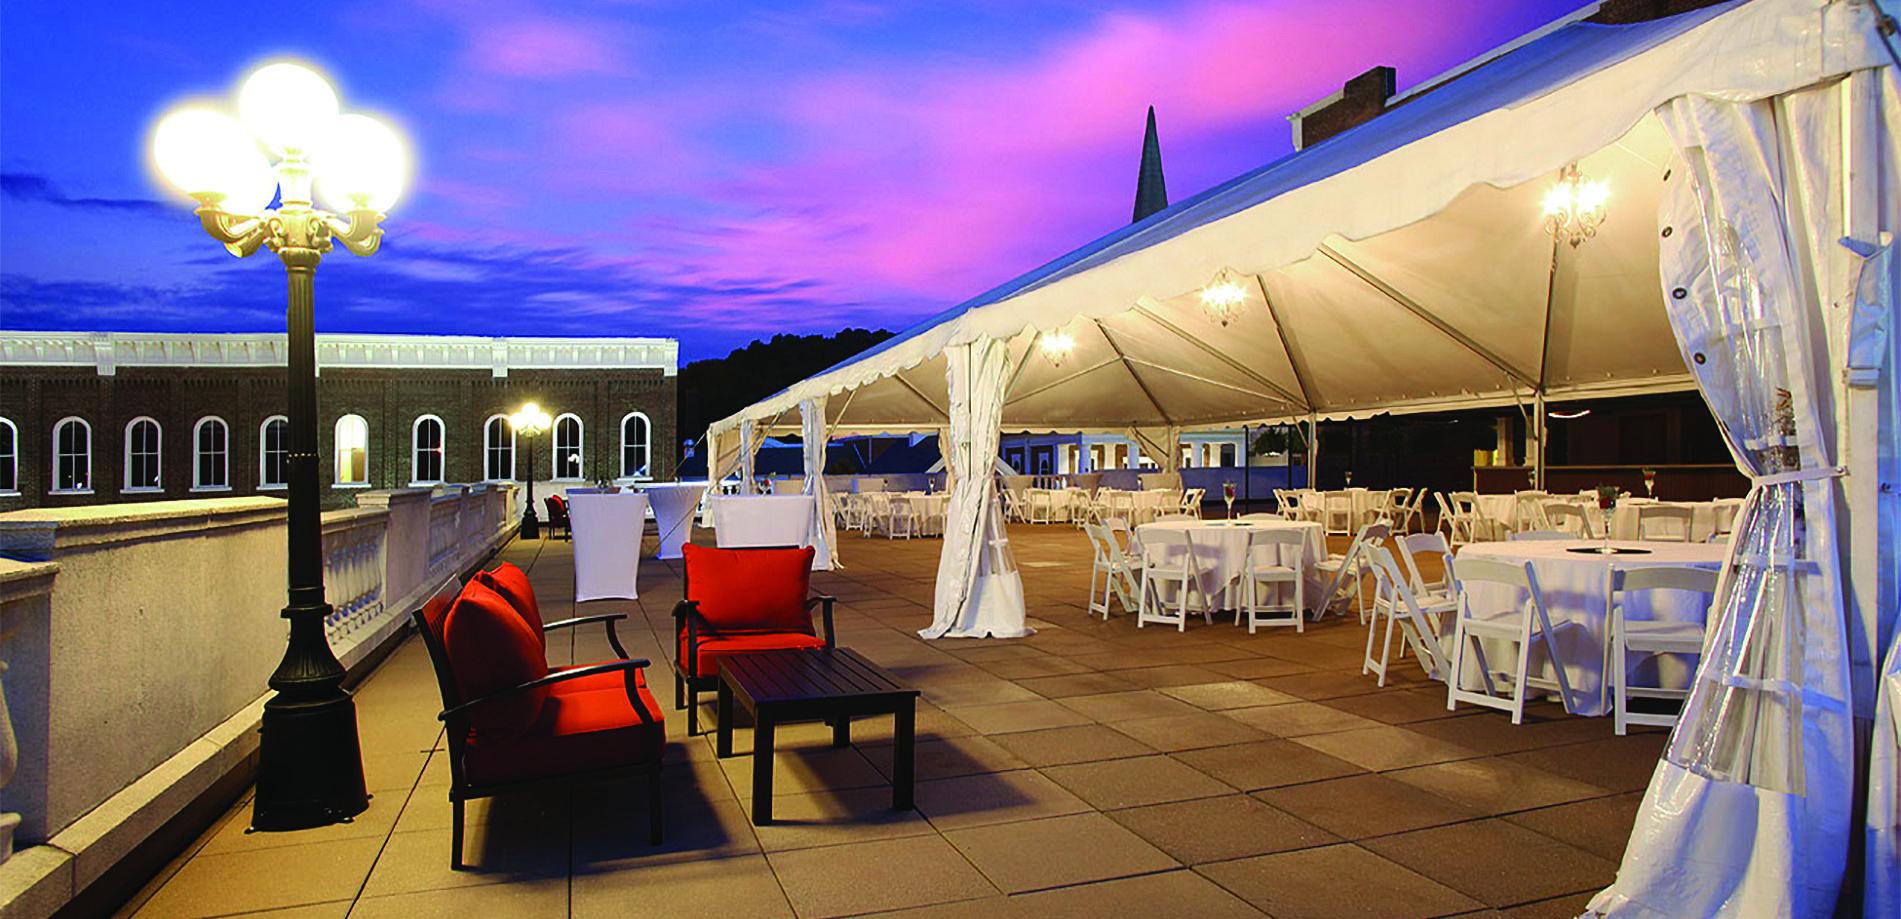 General Morgan Inn - Tri-Cities Reception & Wedding Site | Tri ...